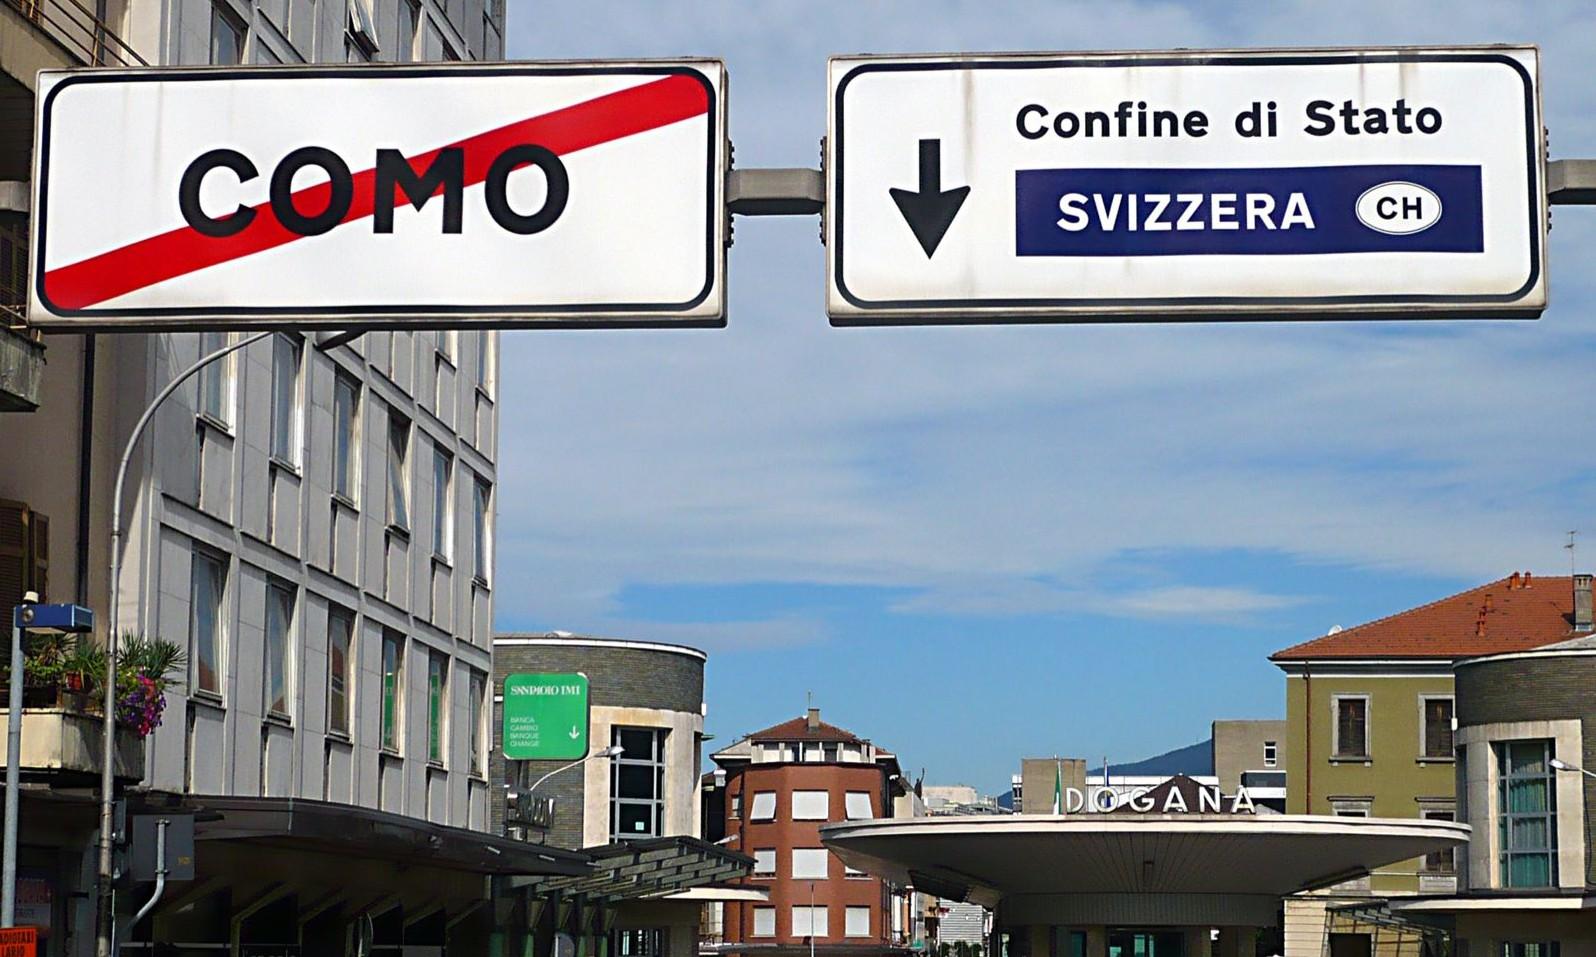 carne contrabbandata in svizzera